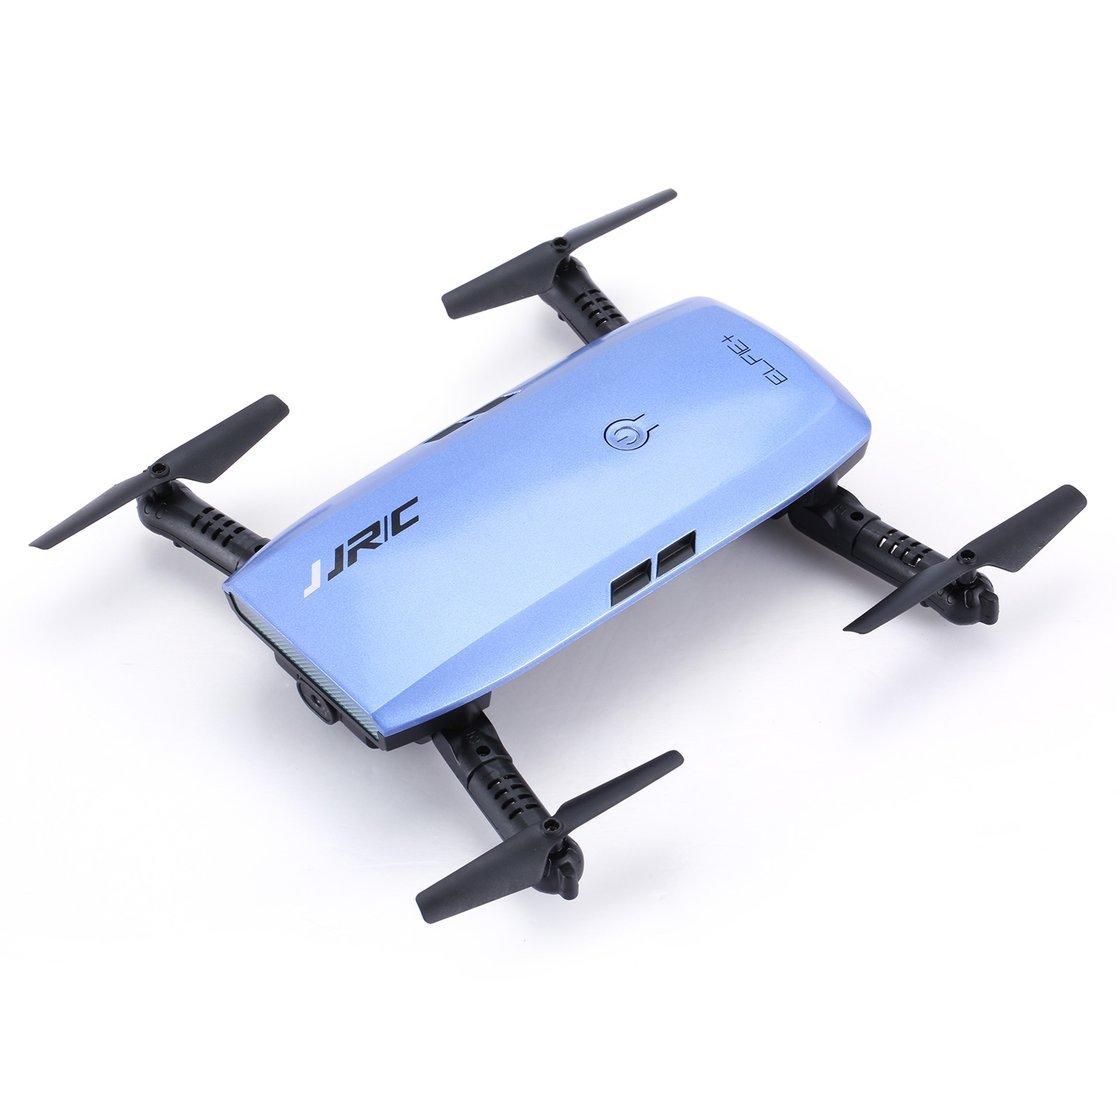 JJR / C H47 Elfie WiFi FPV Drone Mit 720 P HD Kamera Höhe Halten Modus Faltbare G-Sensor Mini RC Selfie Quadcopter